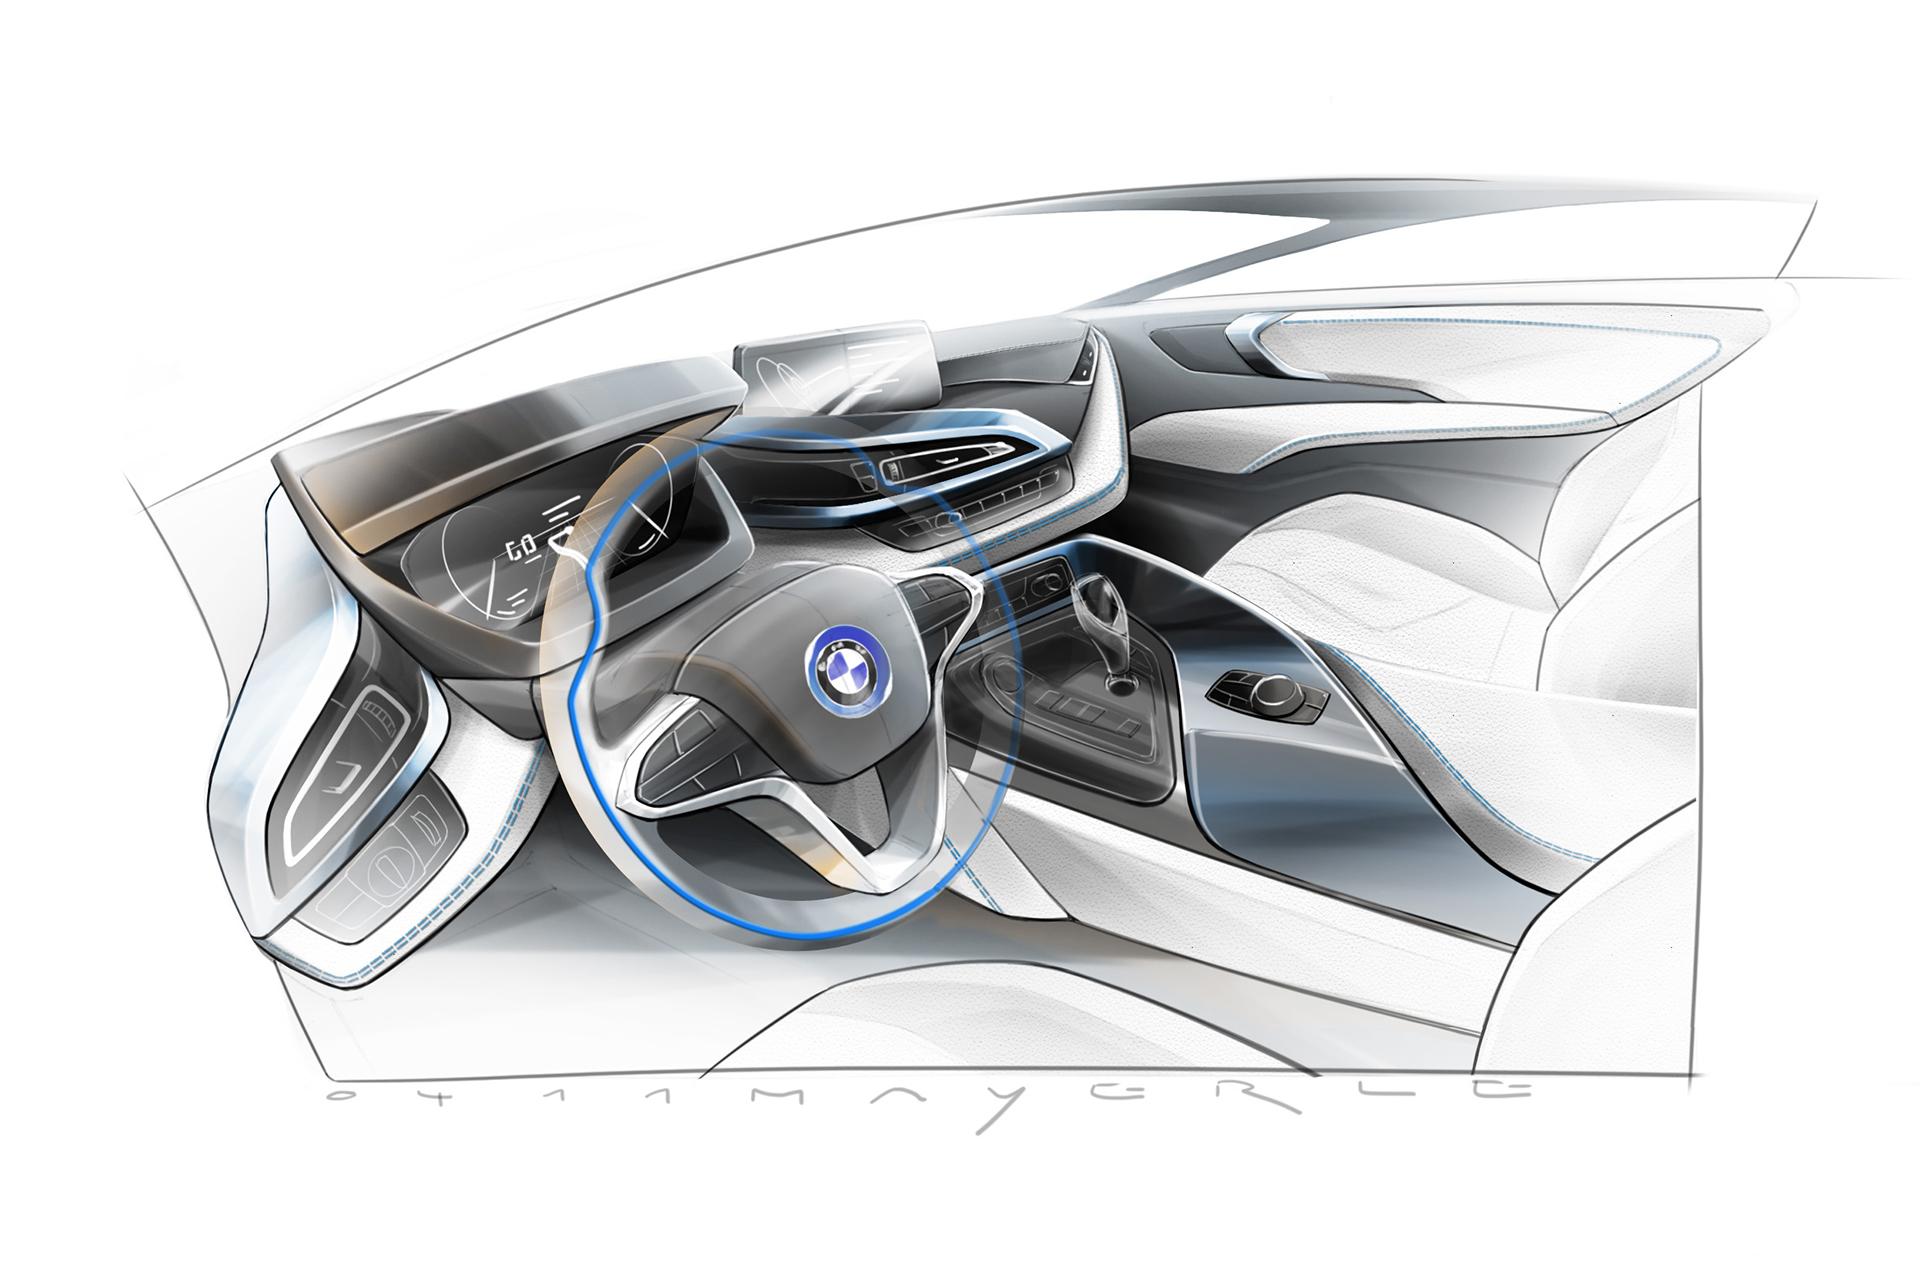 BMW i8 - sketch - interior / intérieur